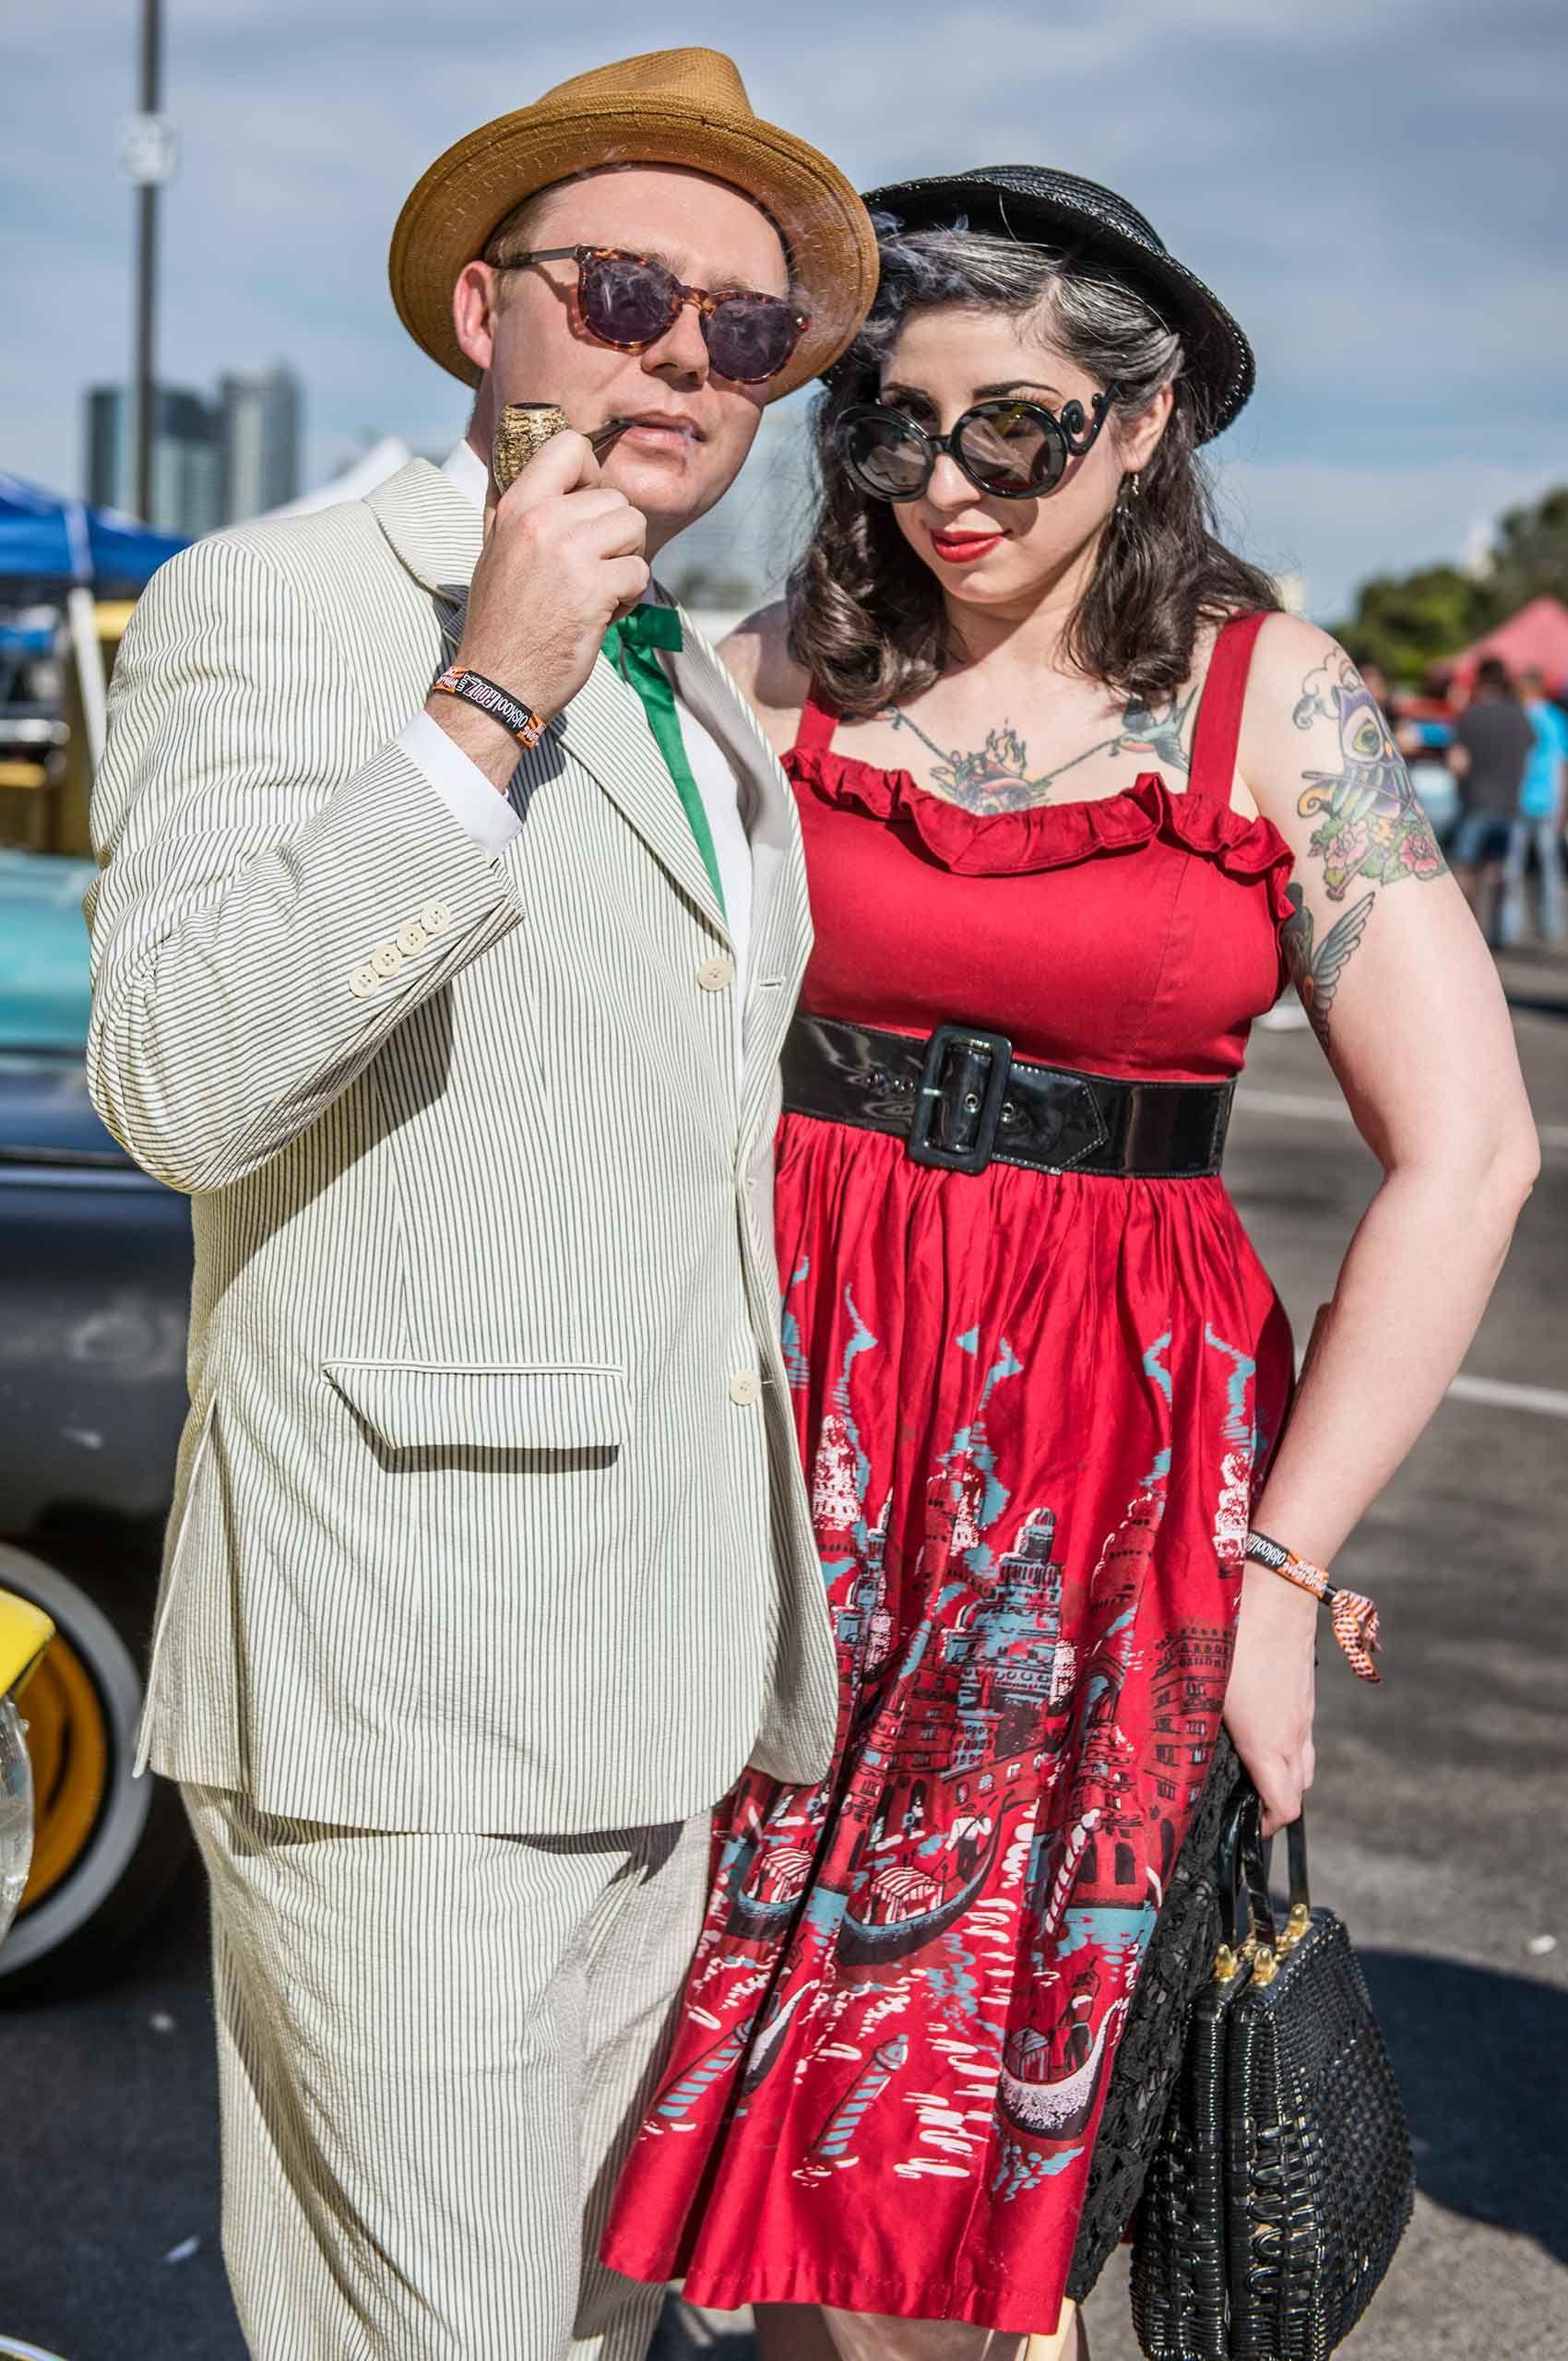 couple-with-pipe-vivalasvegas-rockabillyweekend-lasvegas-by-henrikolundphotography.jpg